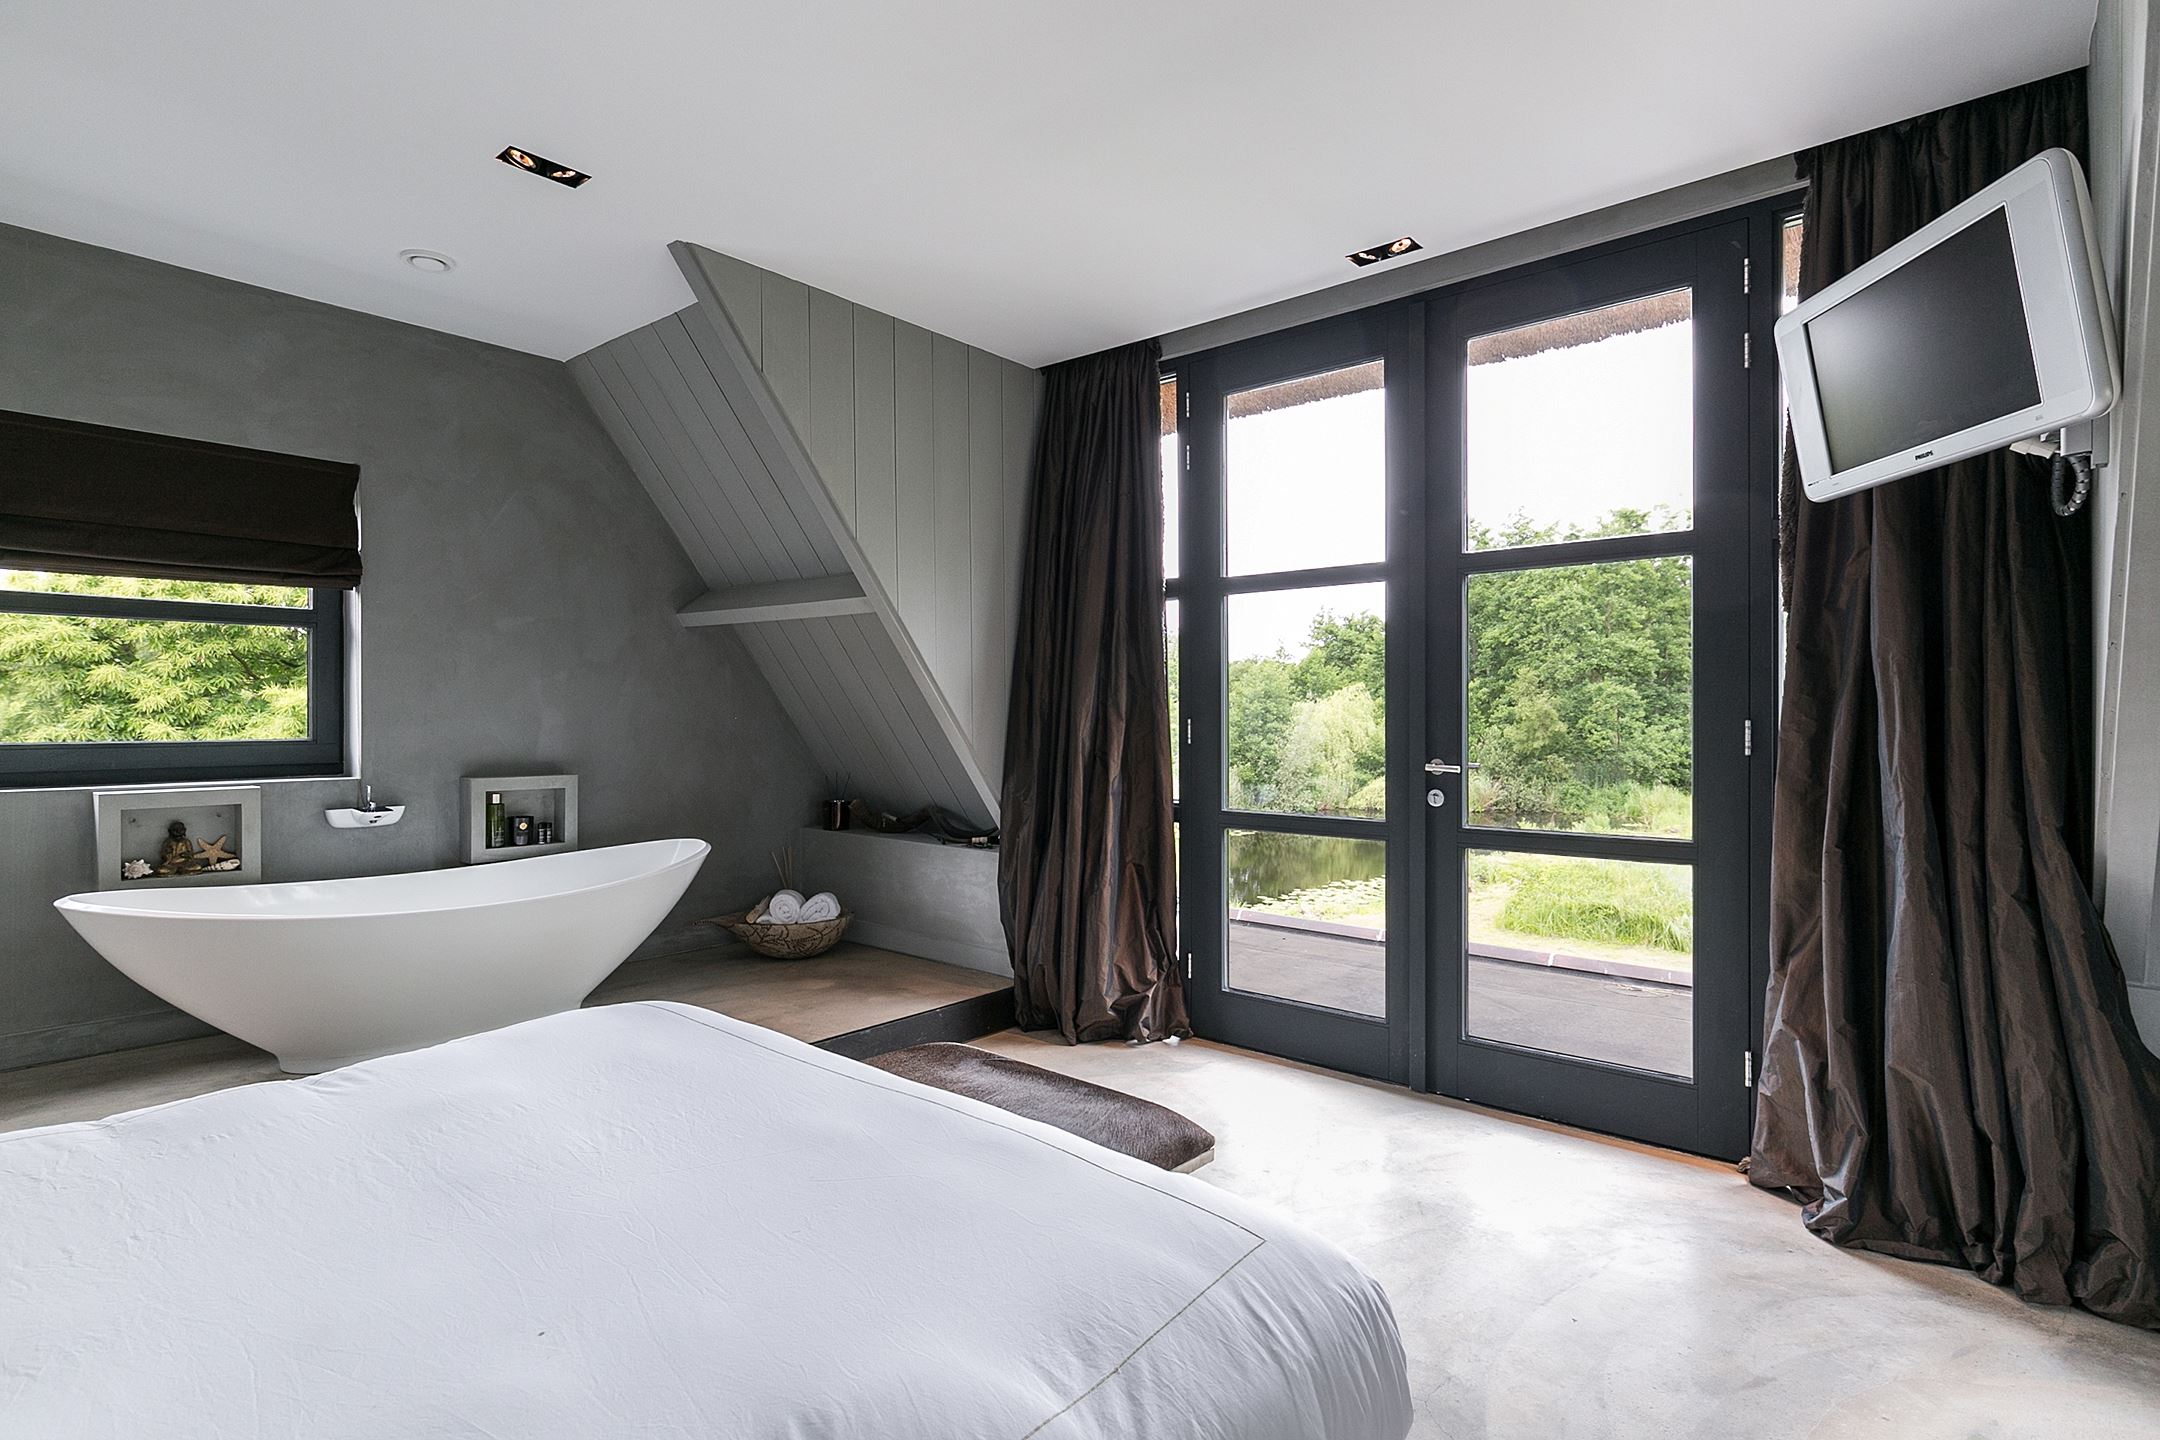 мансарда спальня ванна французское окно